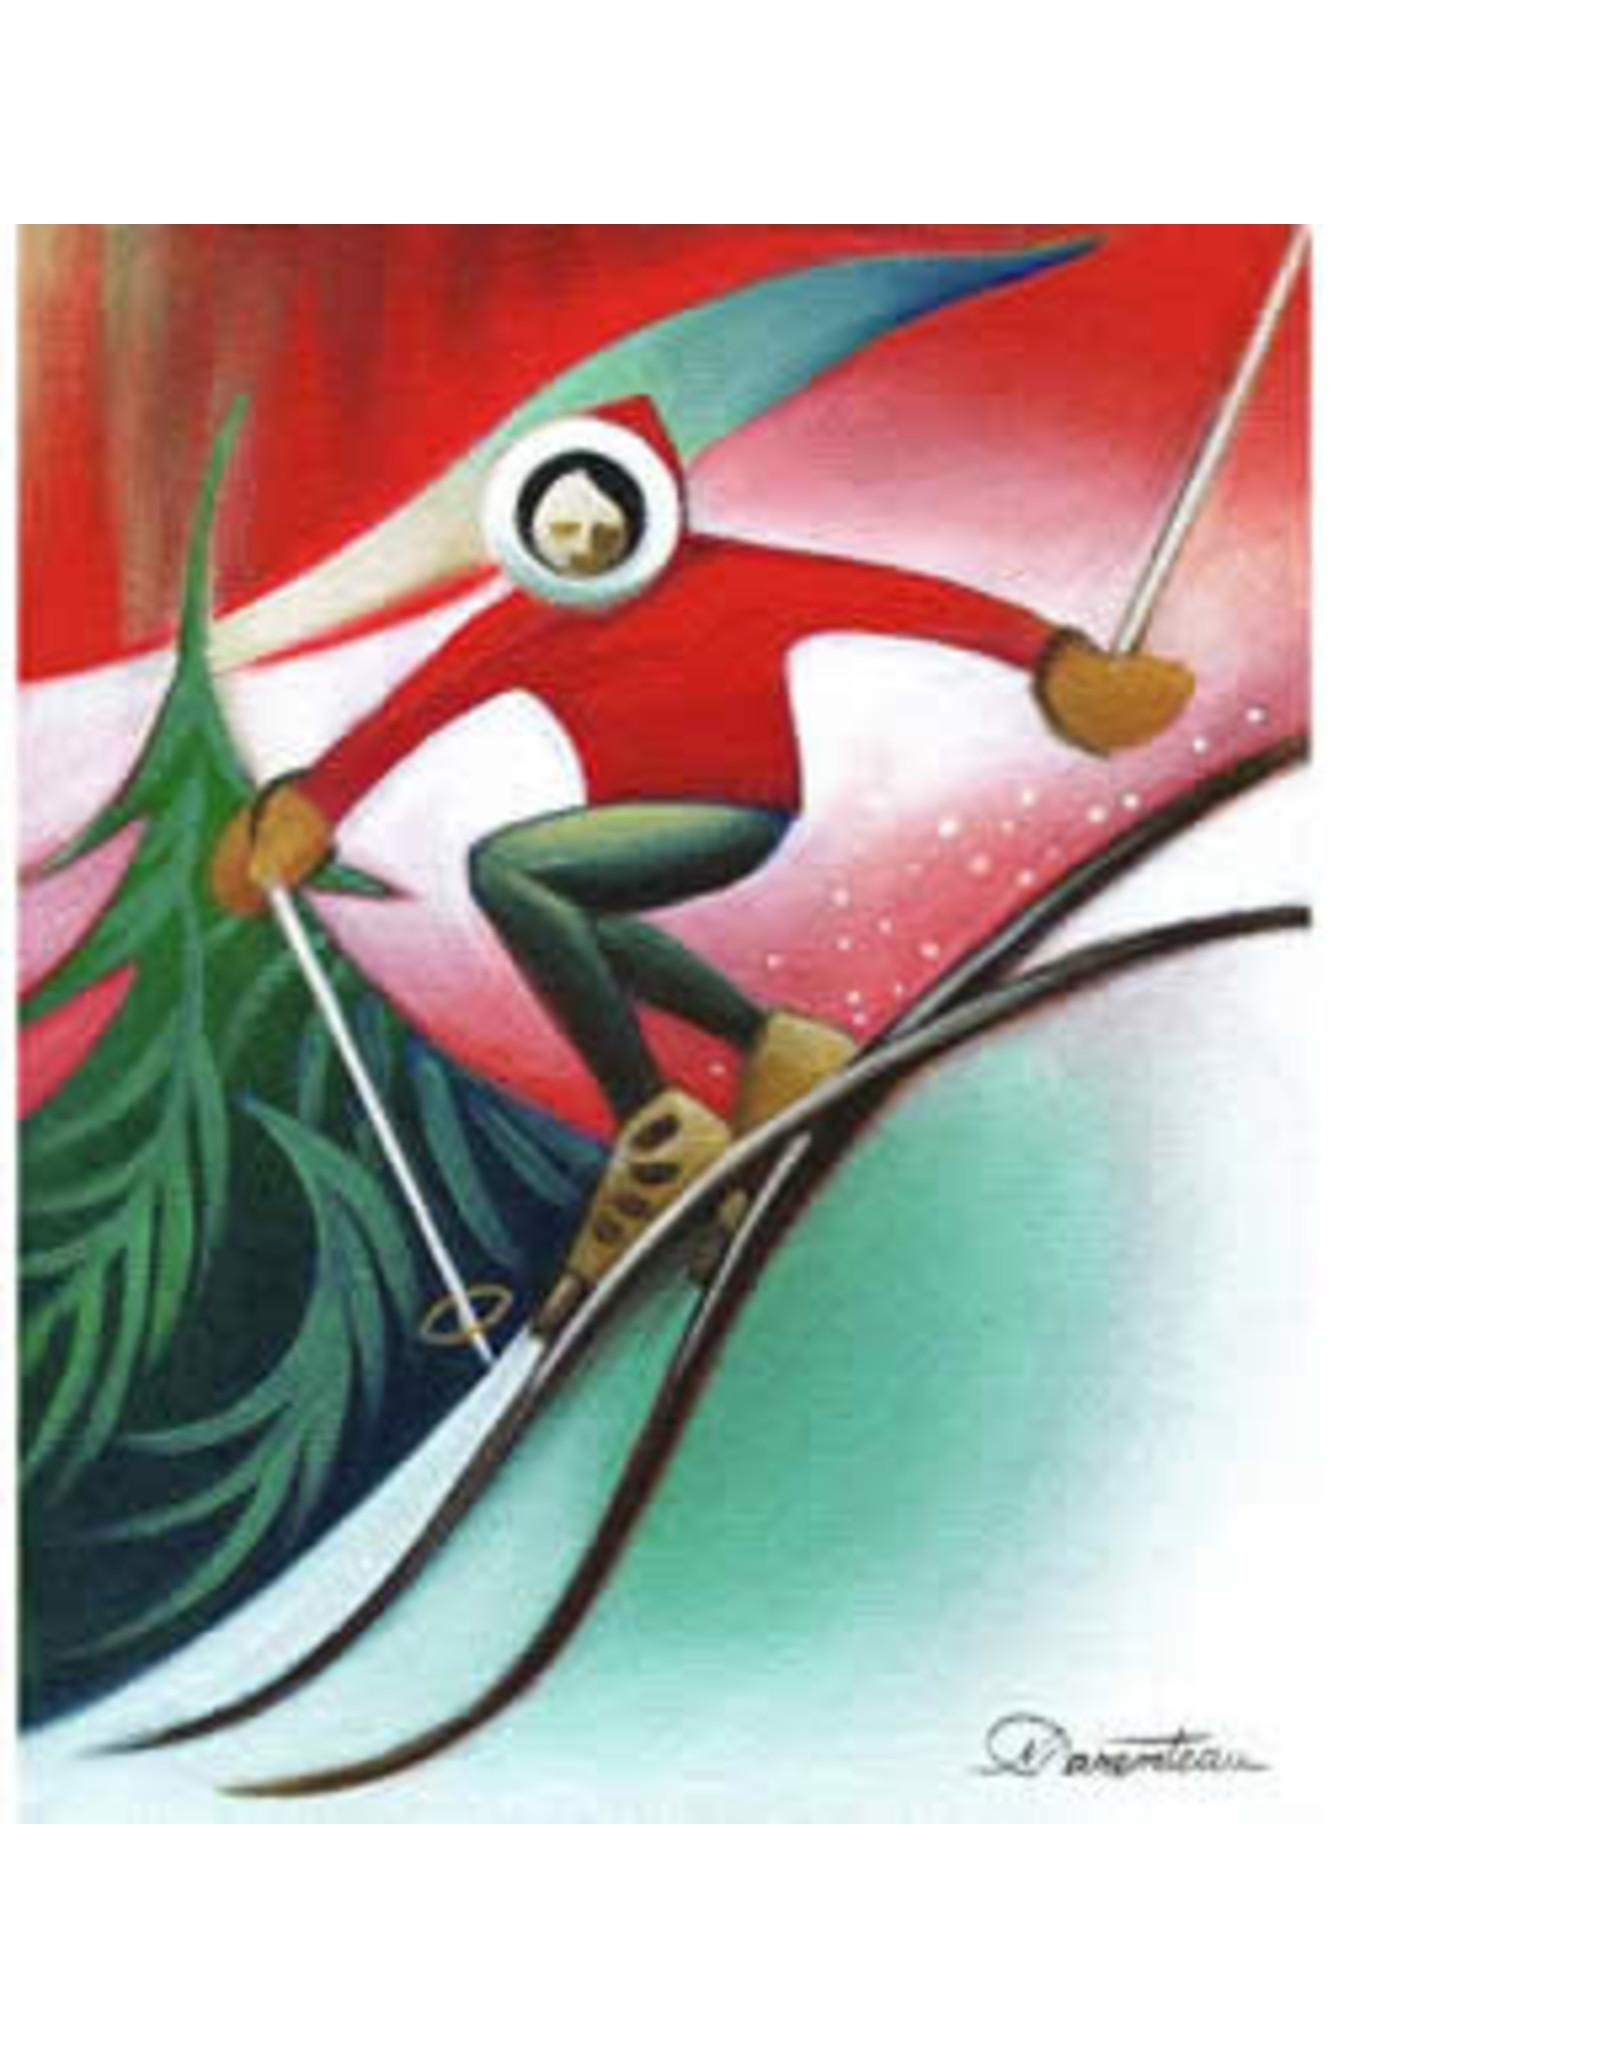 Nathalie Parenteau Retro Skier | Nathalie Parenteau